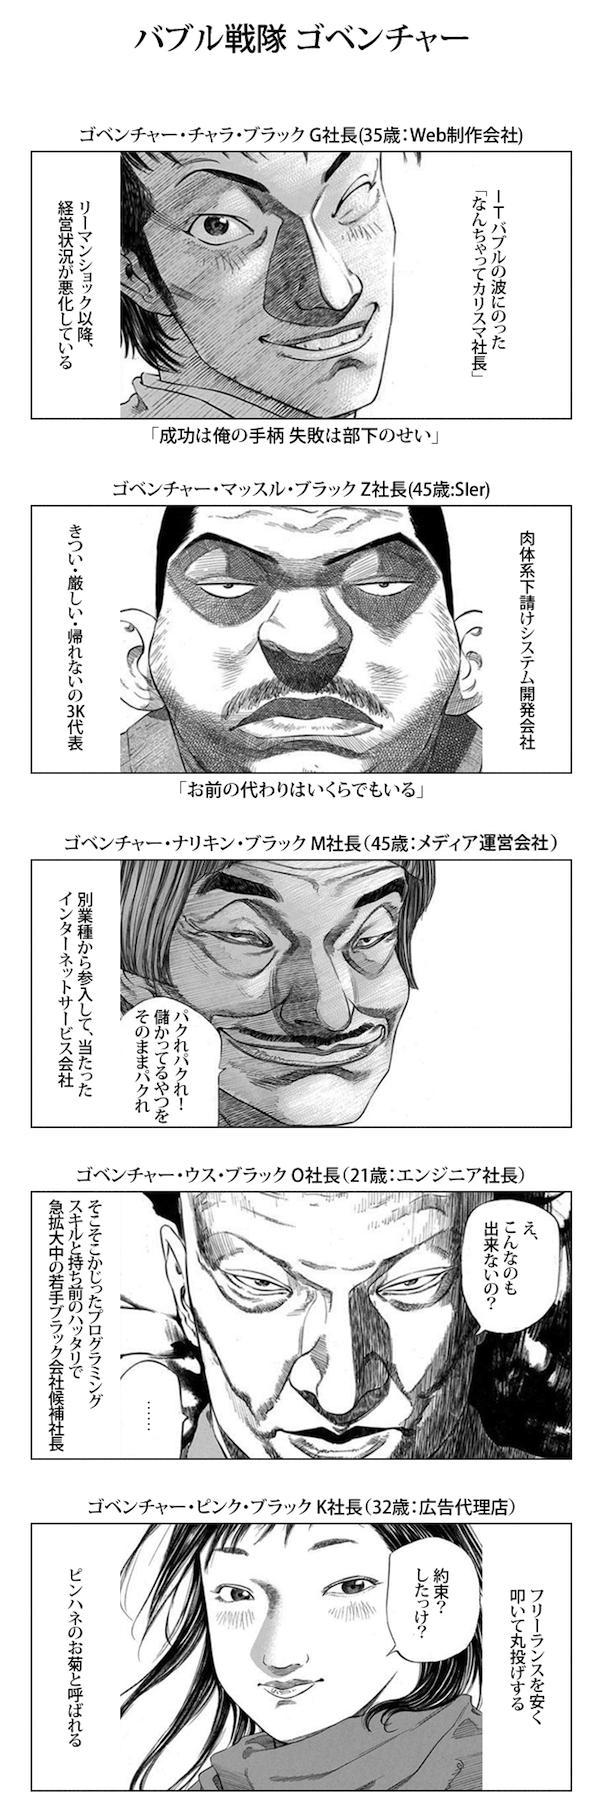 Yorosiku black company 02